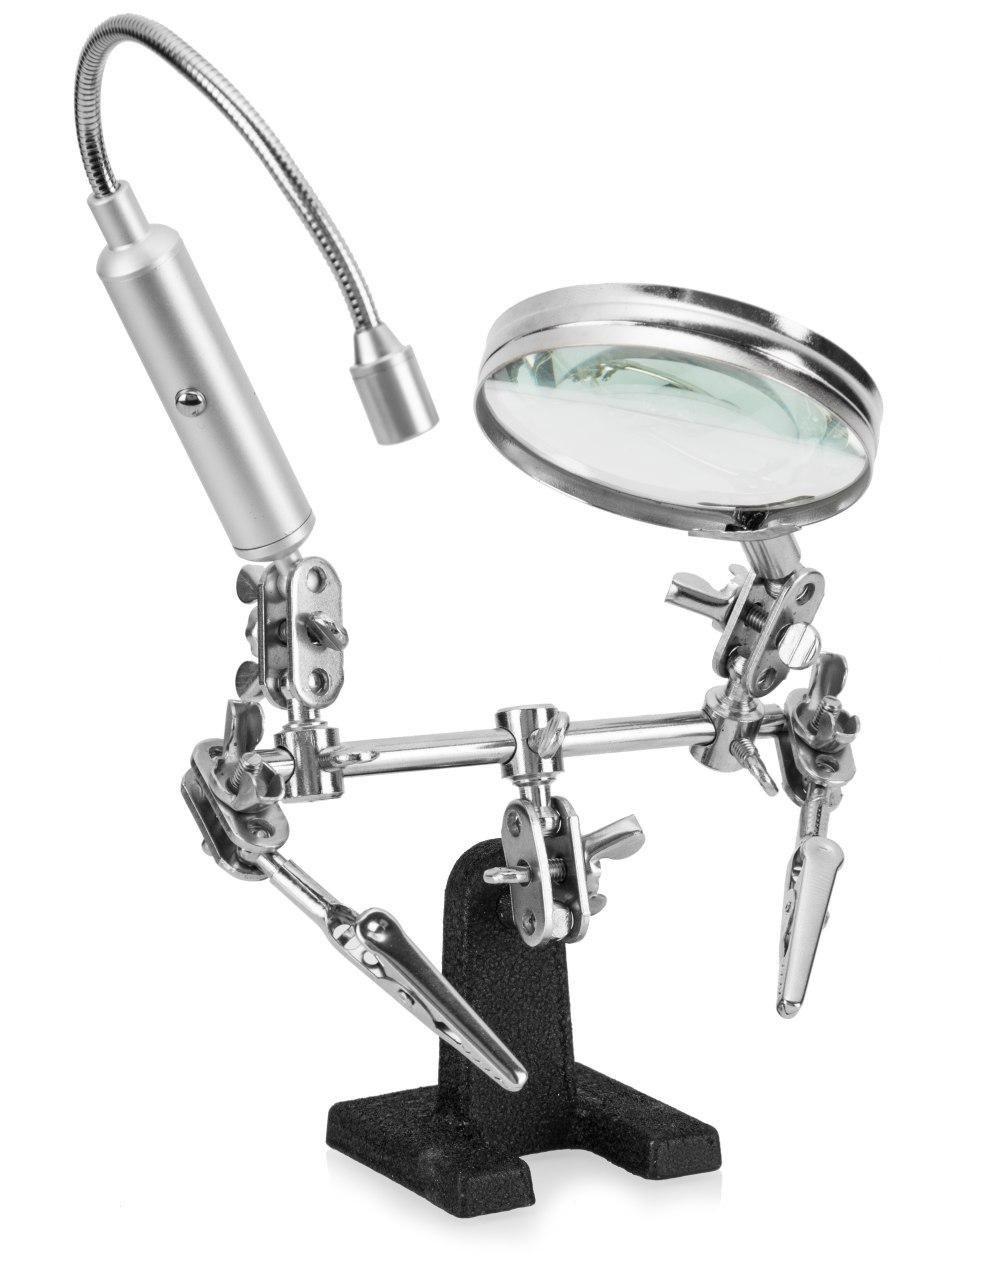 Ram Pro Magnifier Flexible Flashlight Alligator